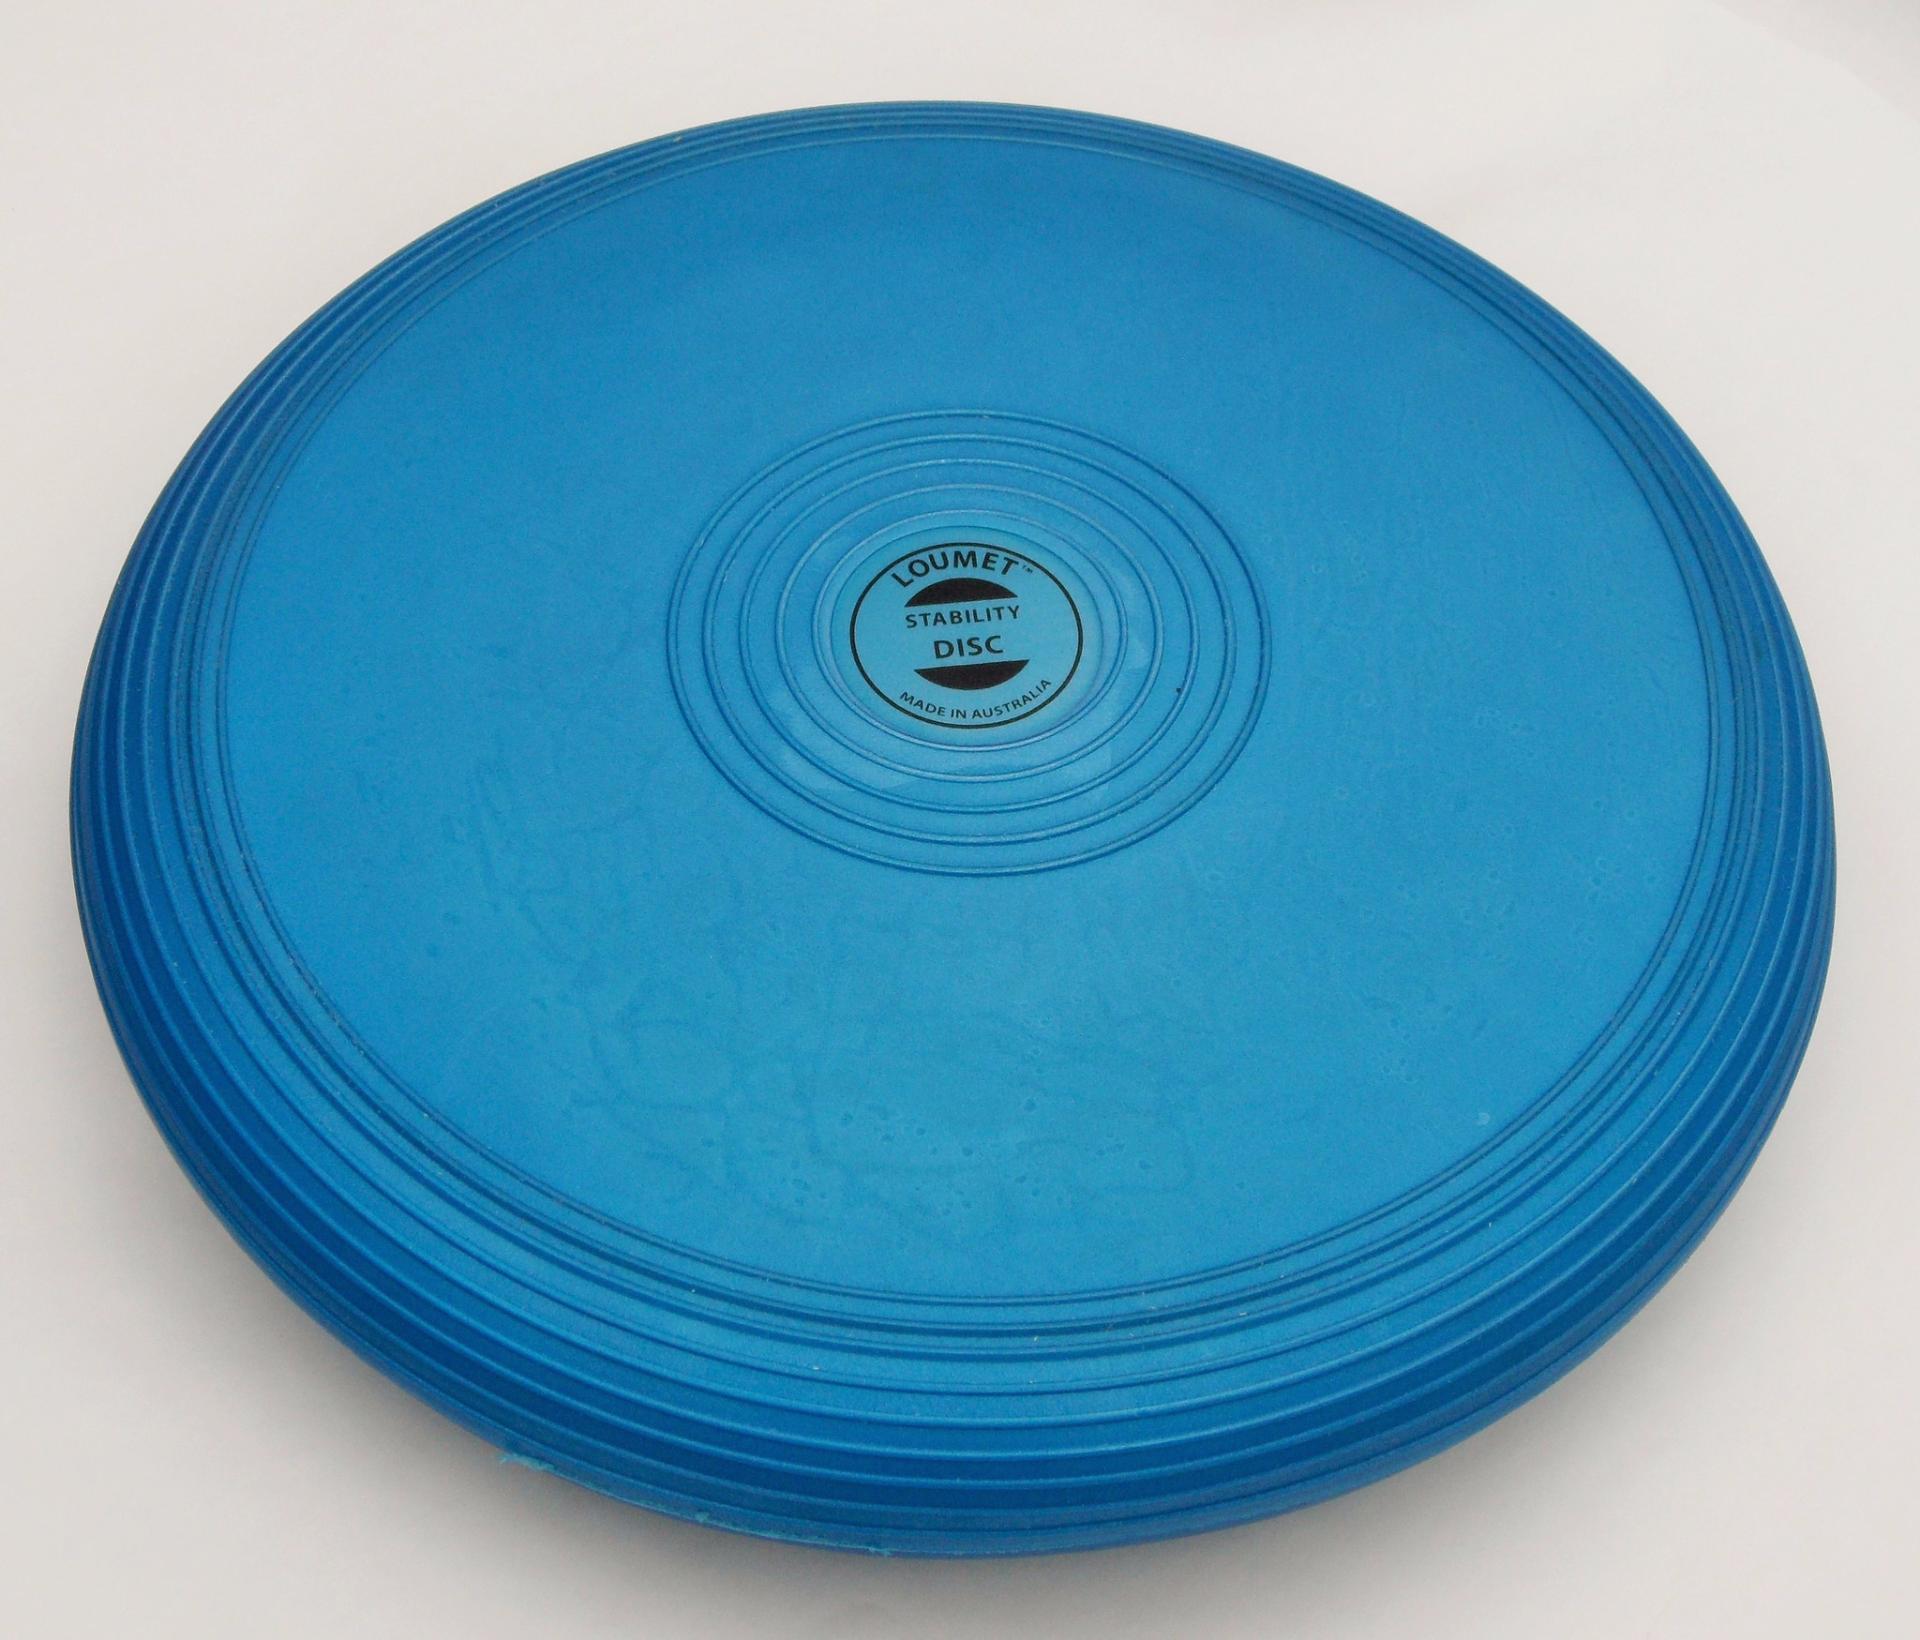 Loumet™ Stability Disc